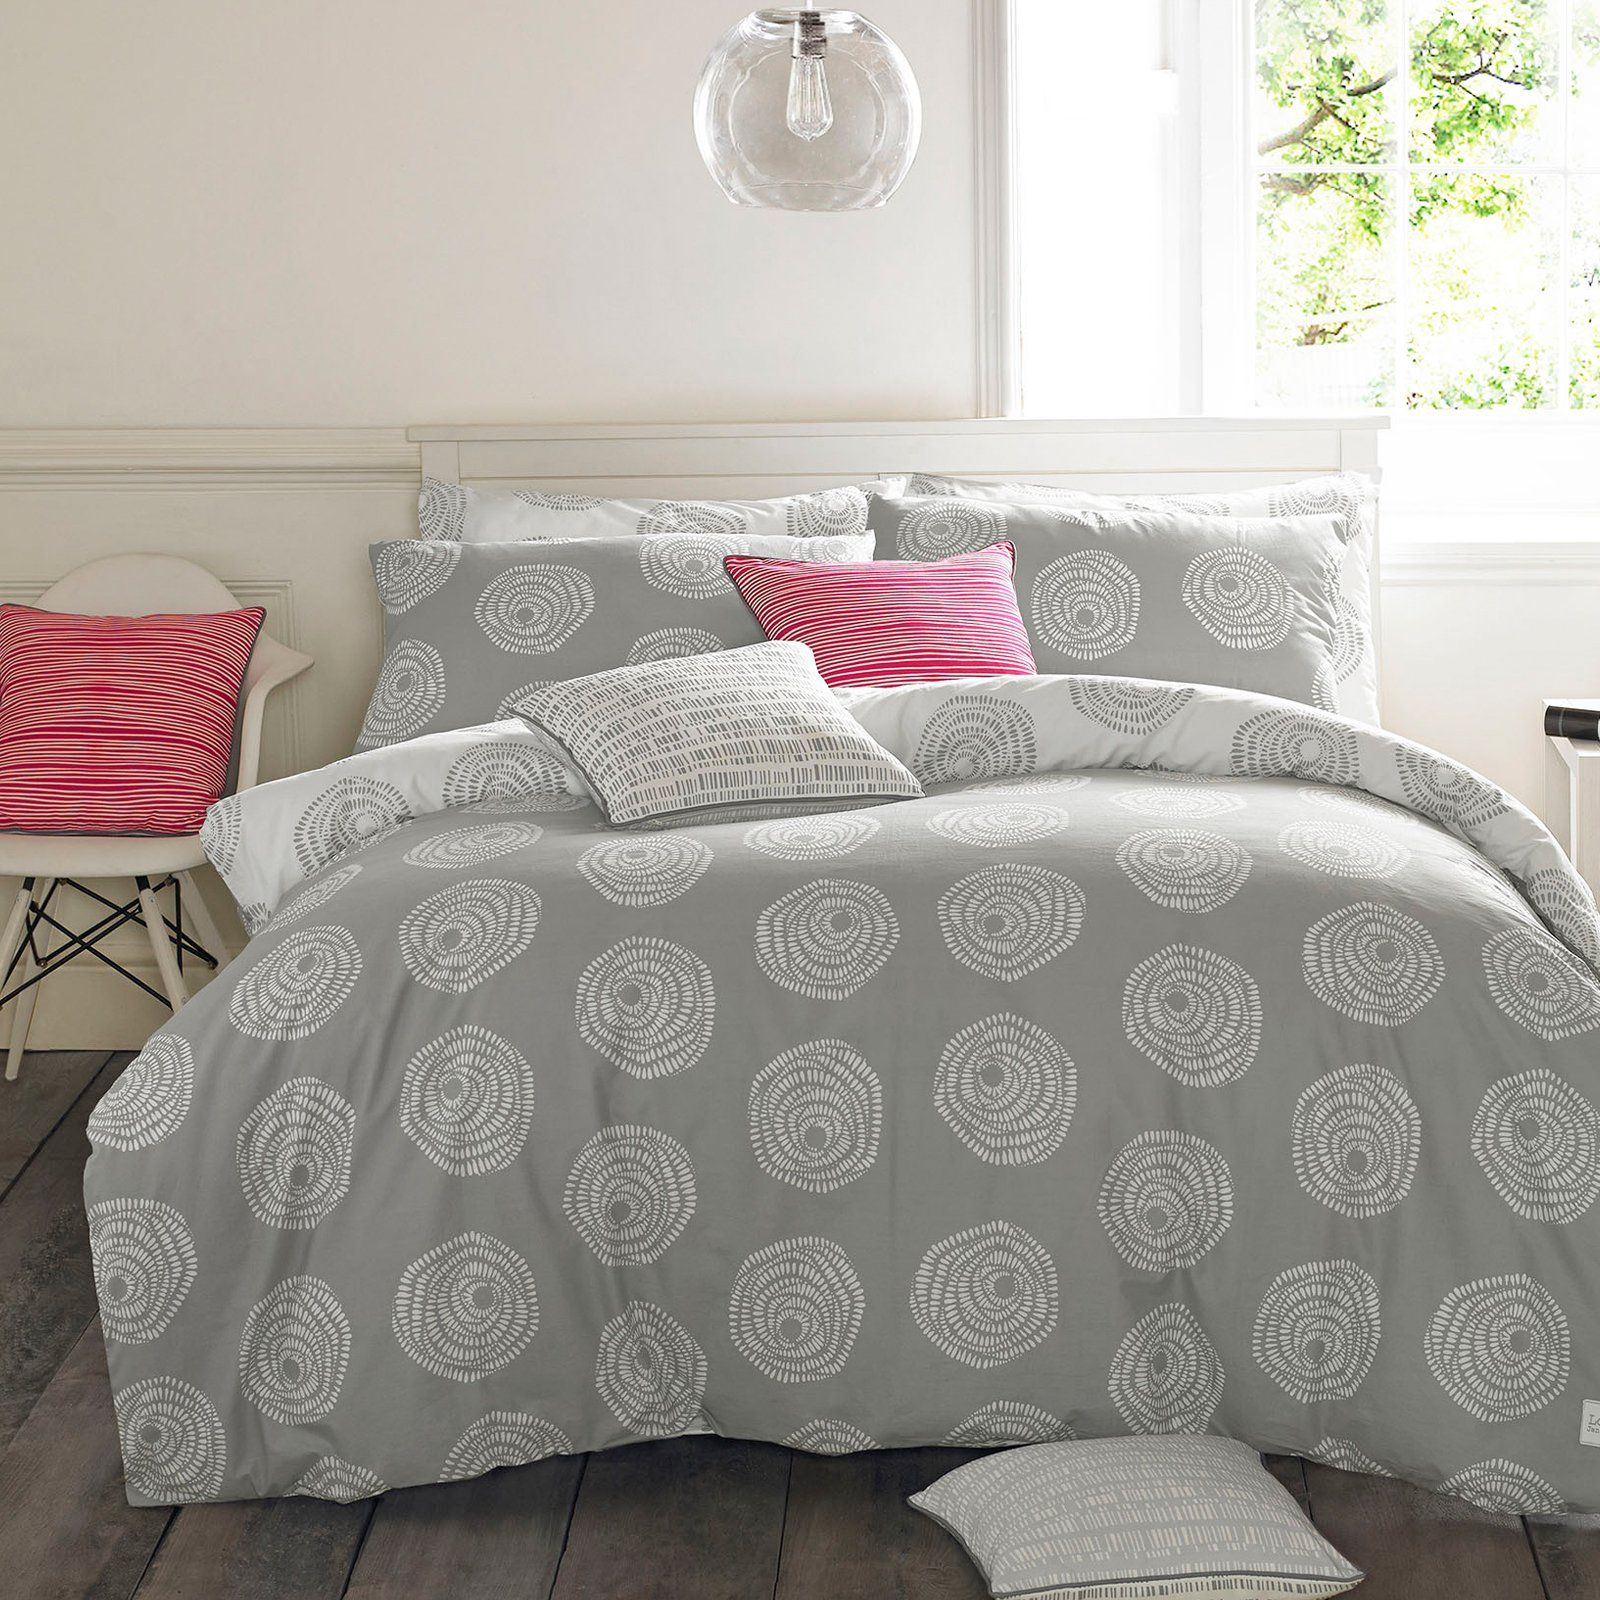 Lotta Jansdotter Sylloda Bed Linen by Ashley Wilde Duvet